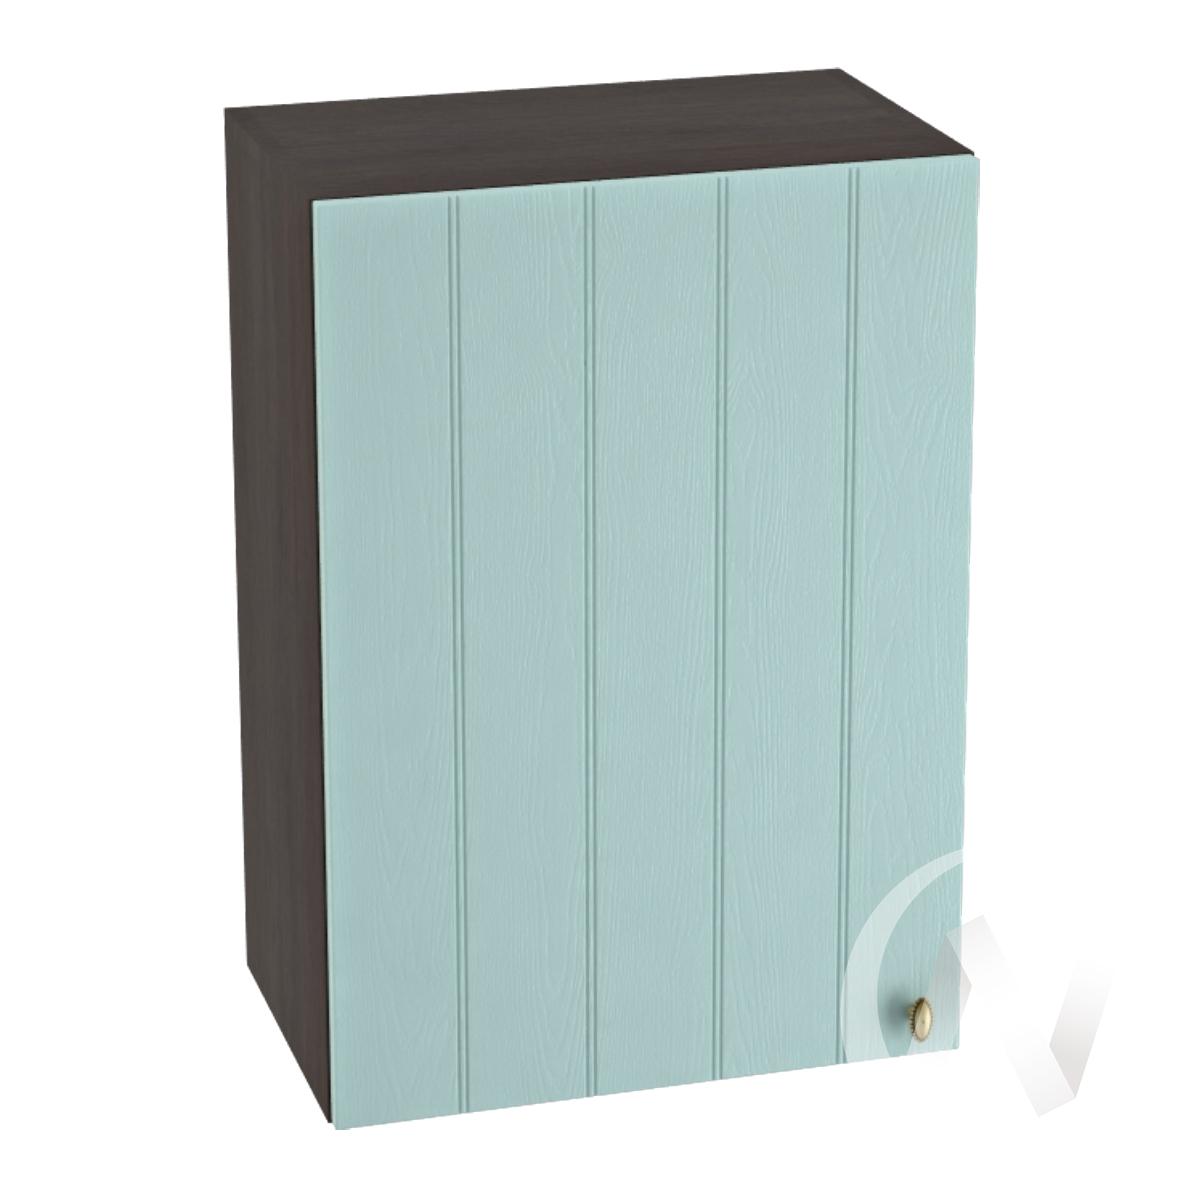 "Кухня ""Прованс"": Шкаф верхний 500, ШВ 500 (голубой/корпус венге)"